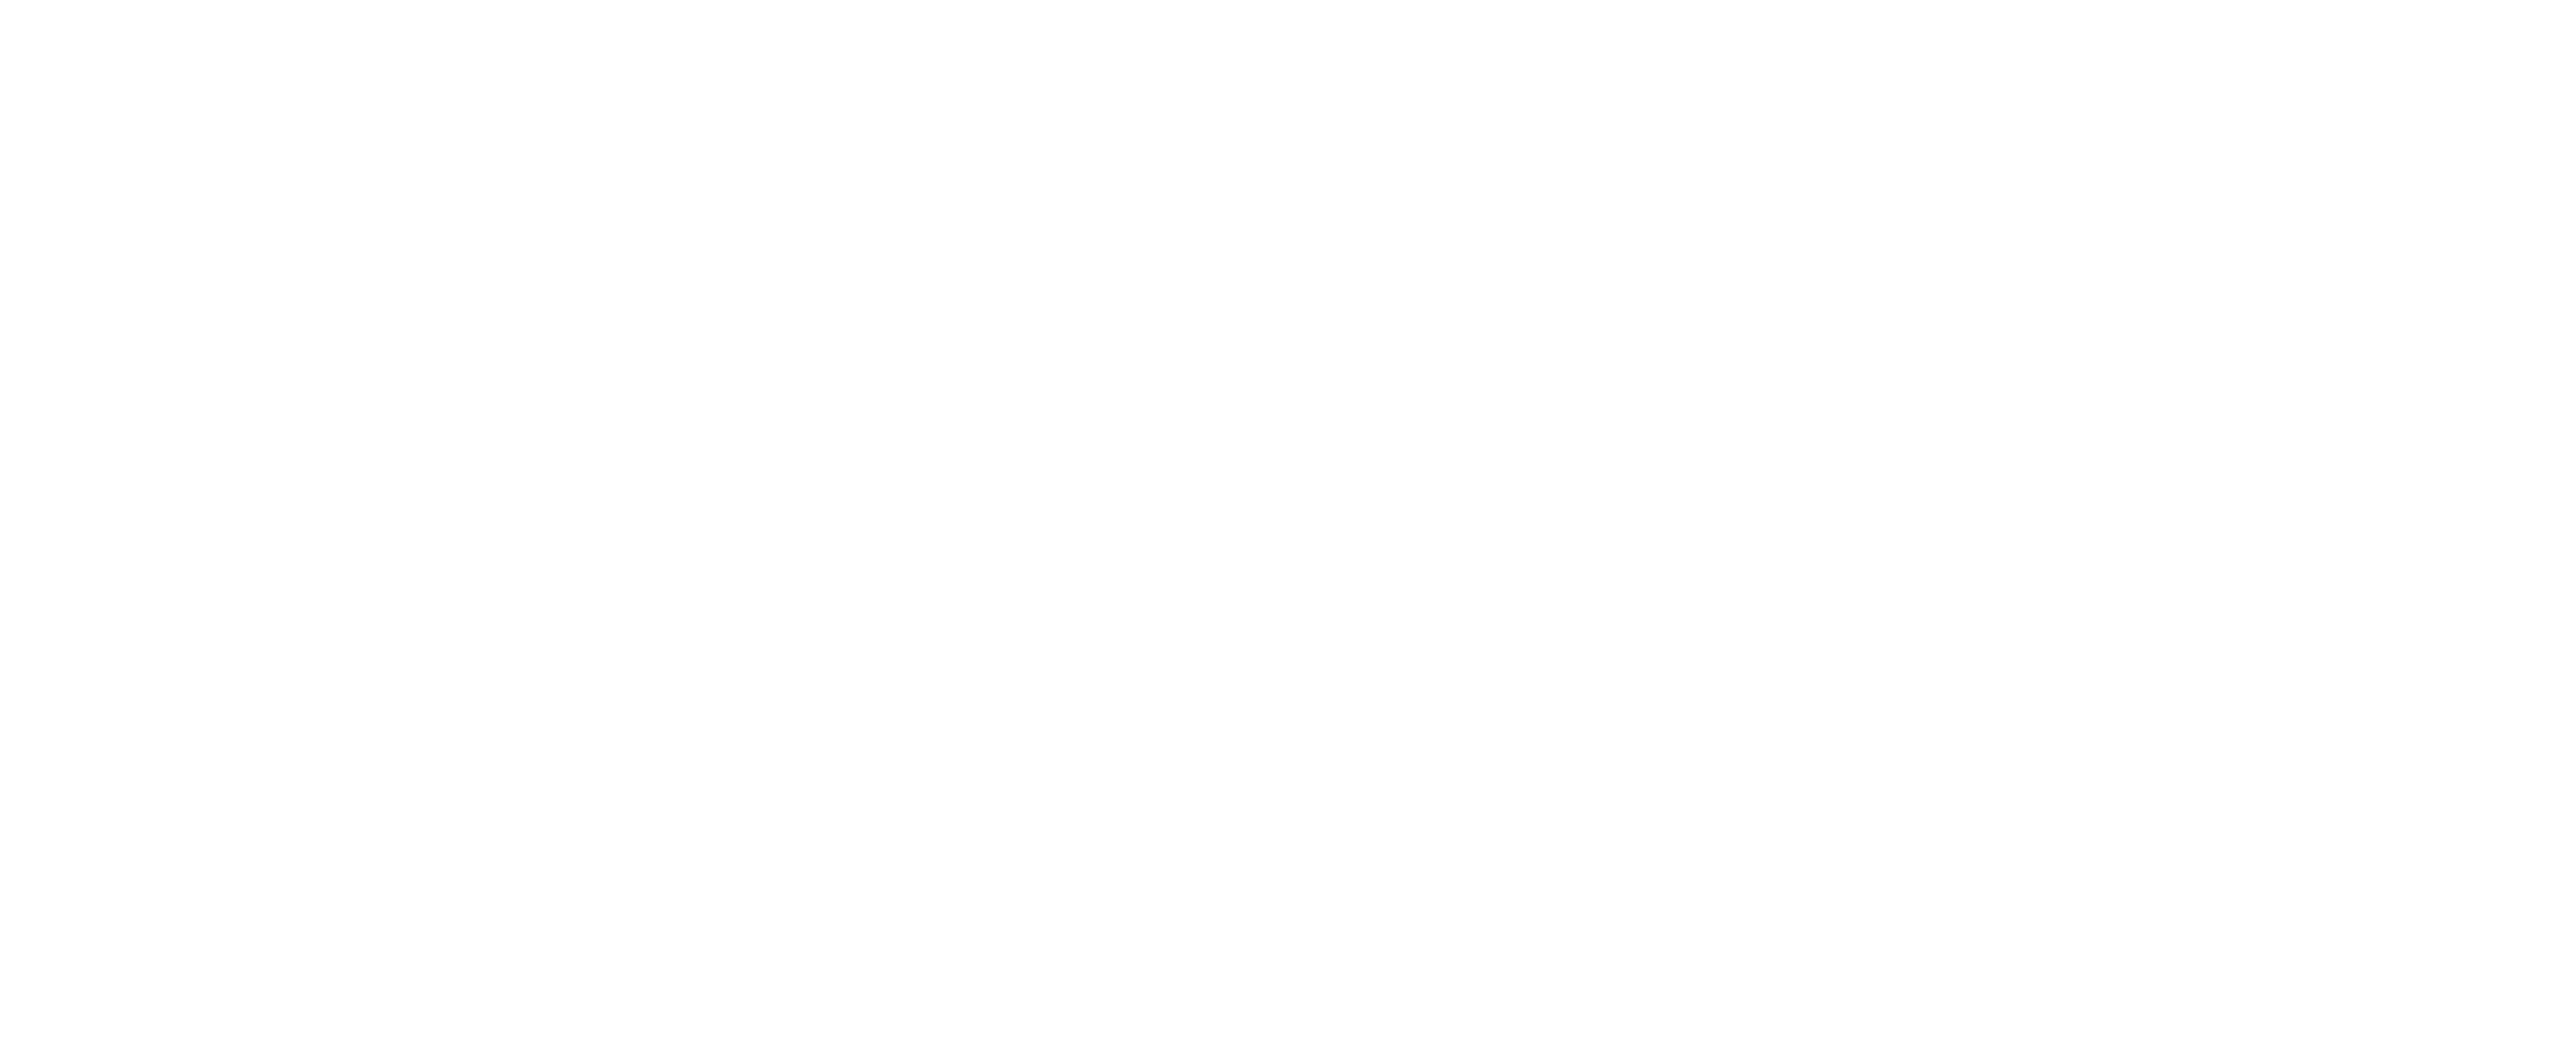 4226x1728 15 Vector Triangles Brush Stroke For Free Download On Mbtskoudsalg